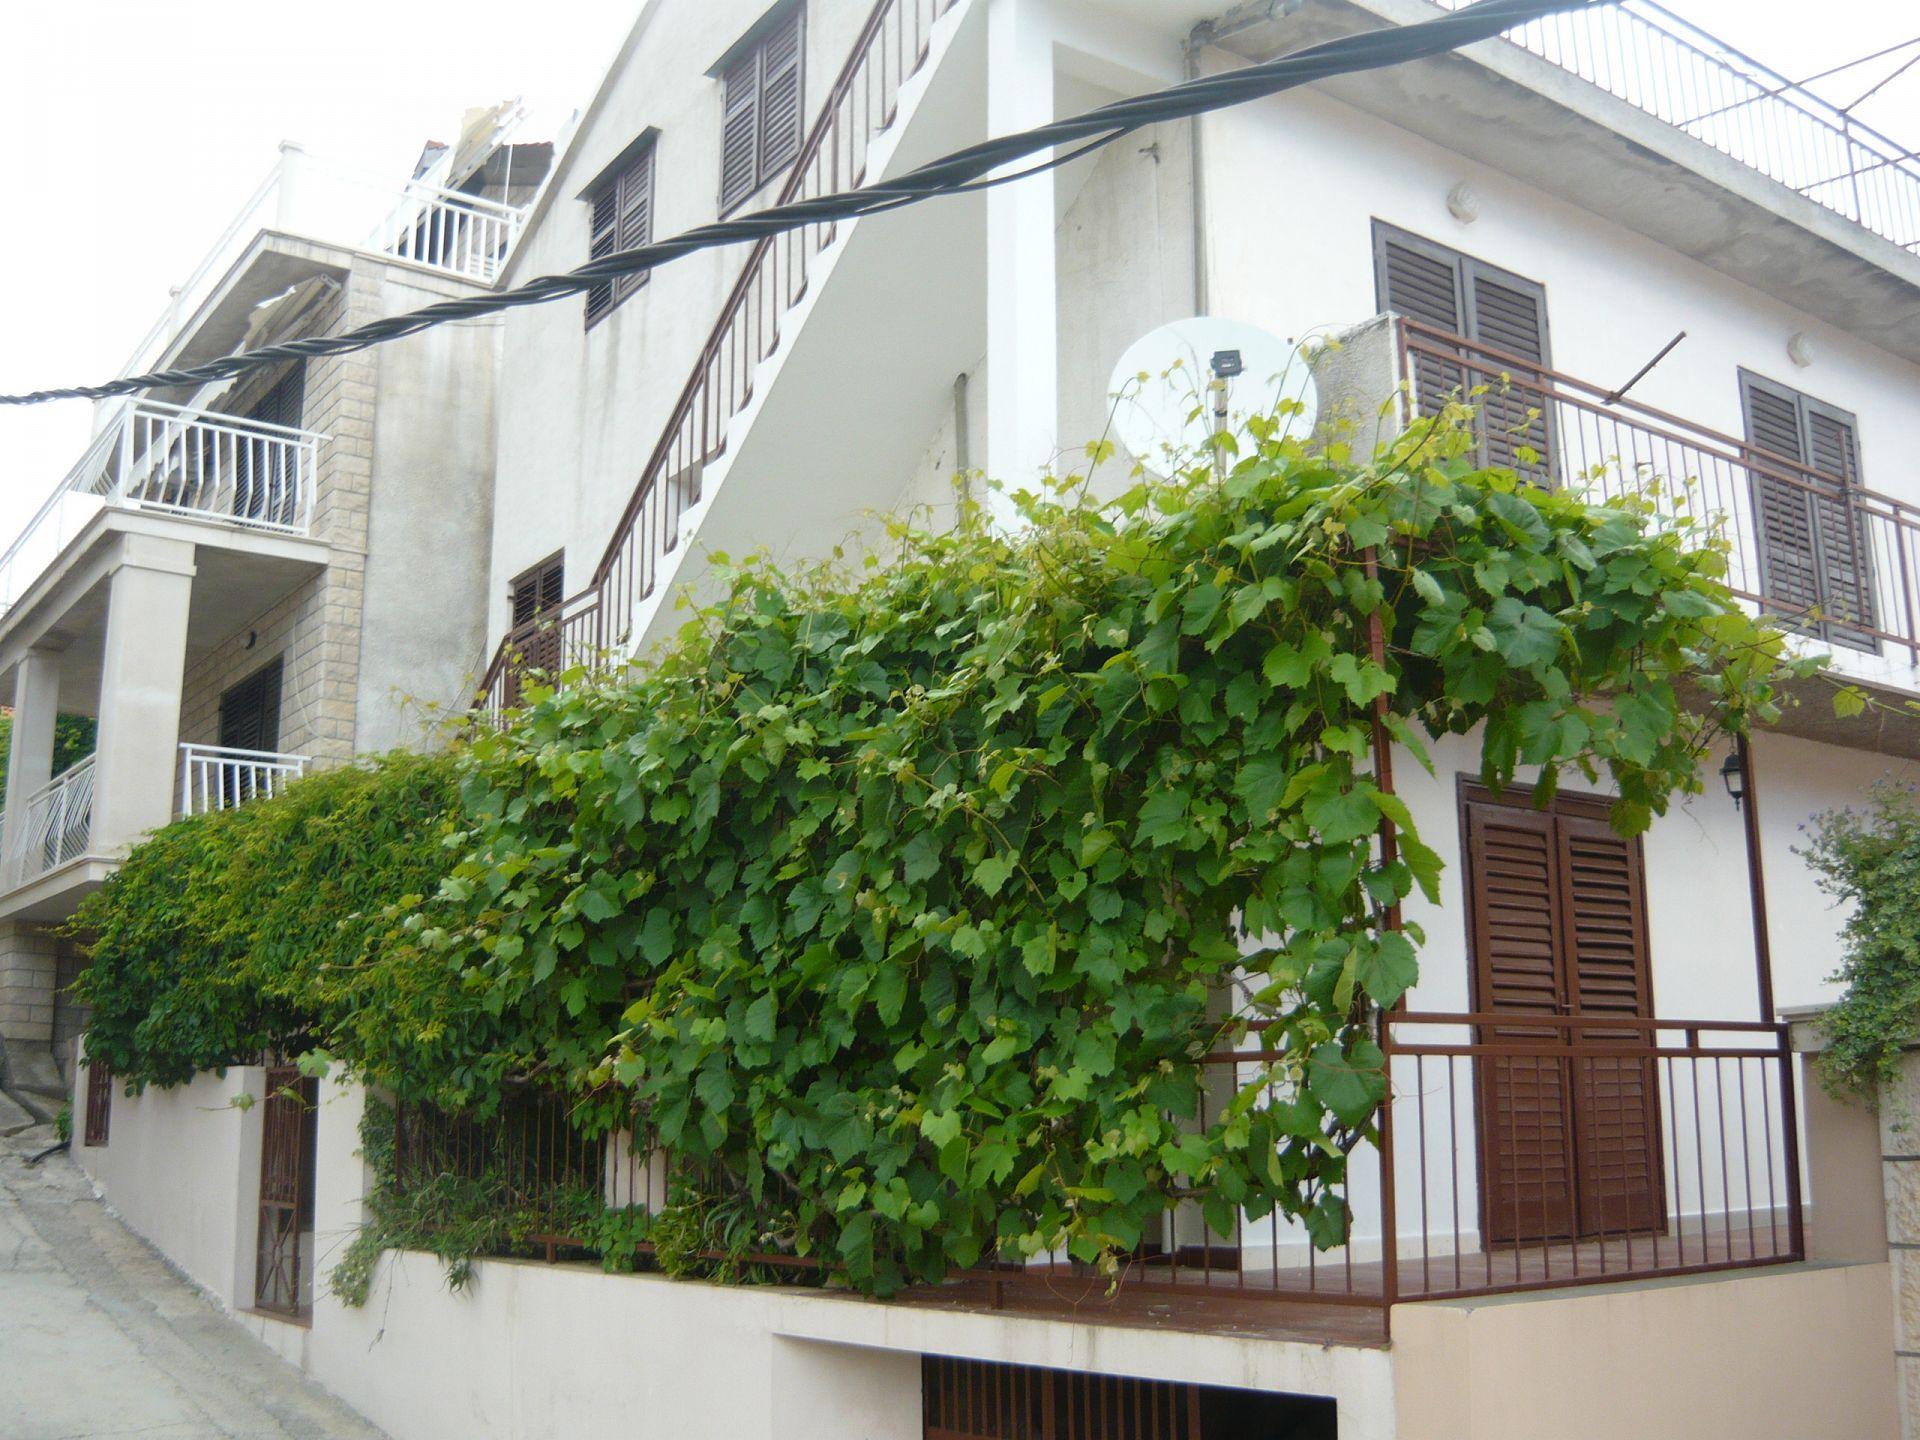 02314SMOK  - Brna - Appartamenti Croazia